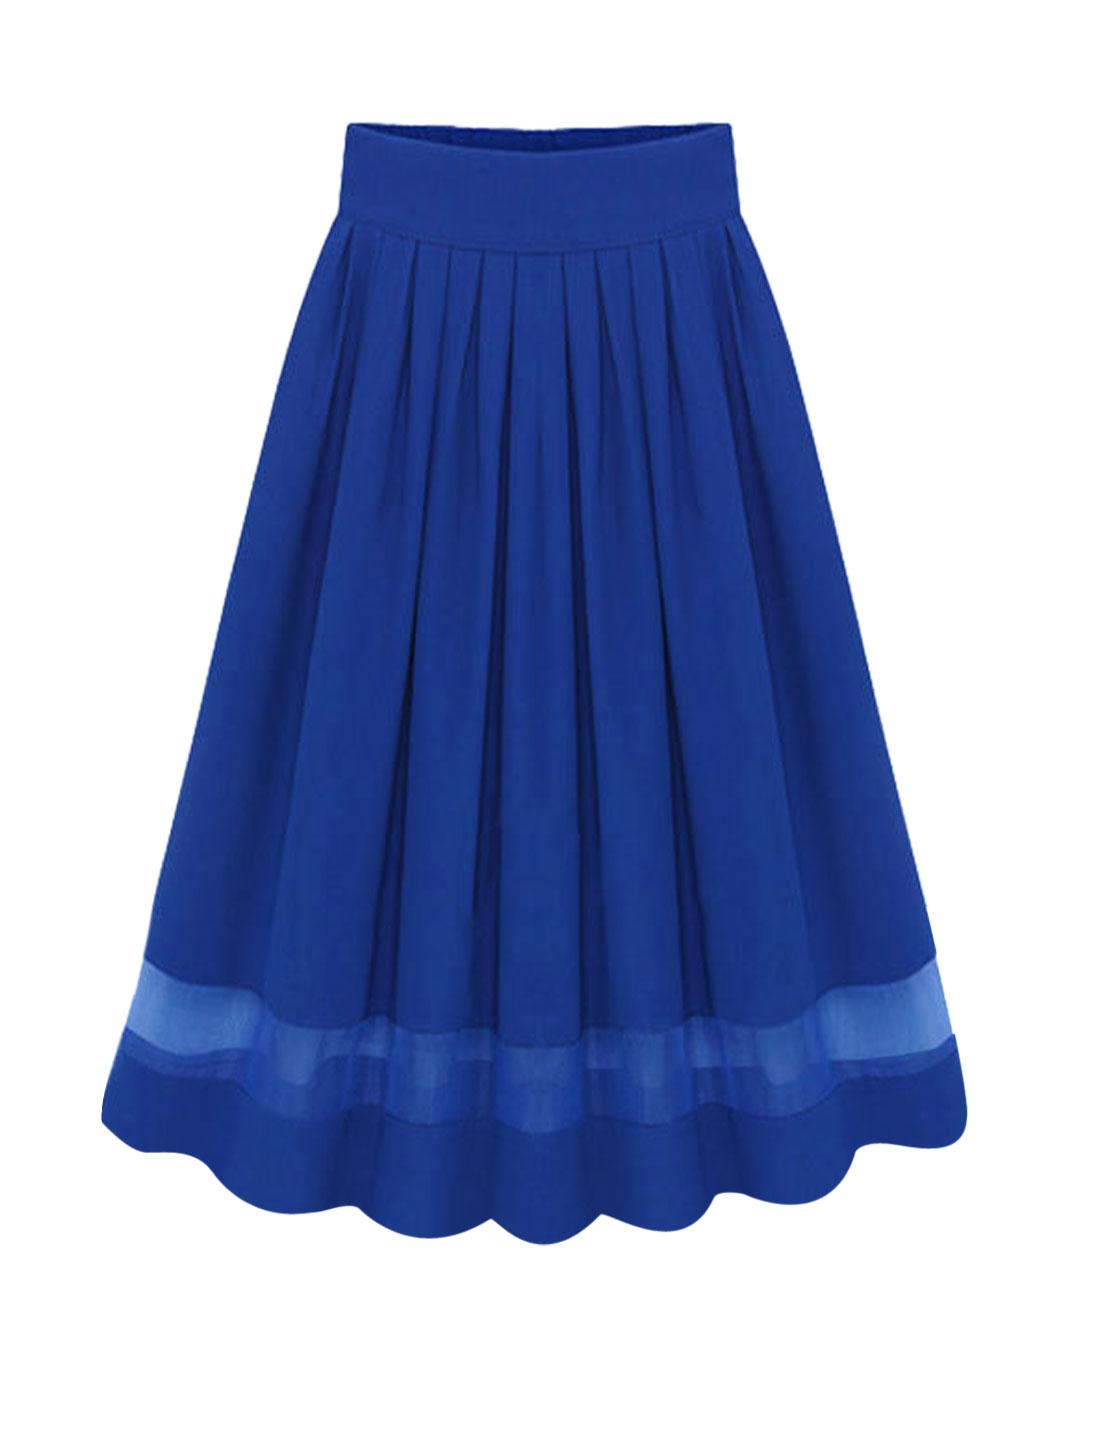 Woman Organza Panel Pleated Detail High Waist A Line Chiffon Skirt Dark Blue M